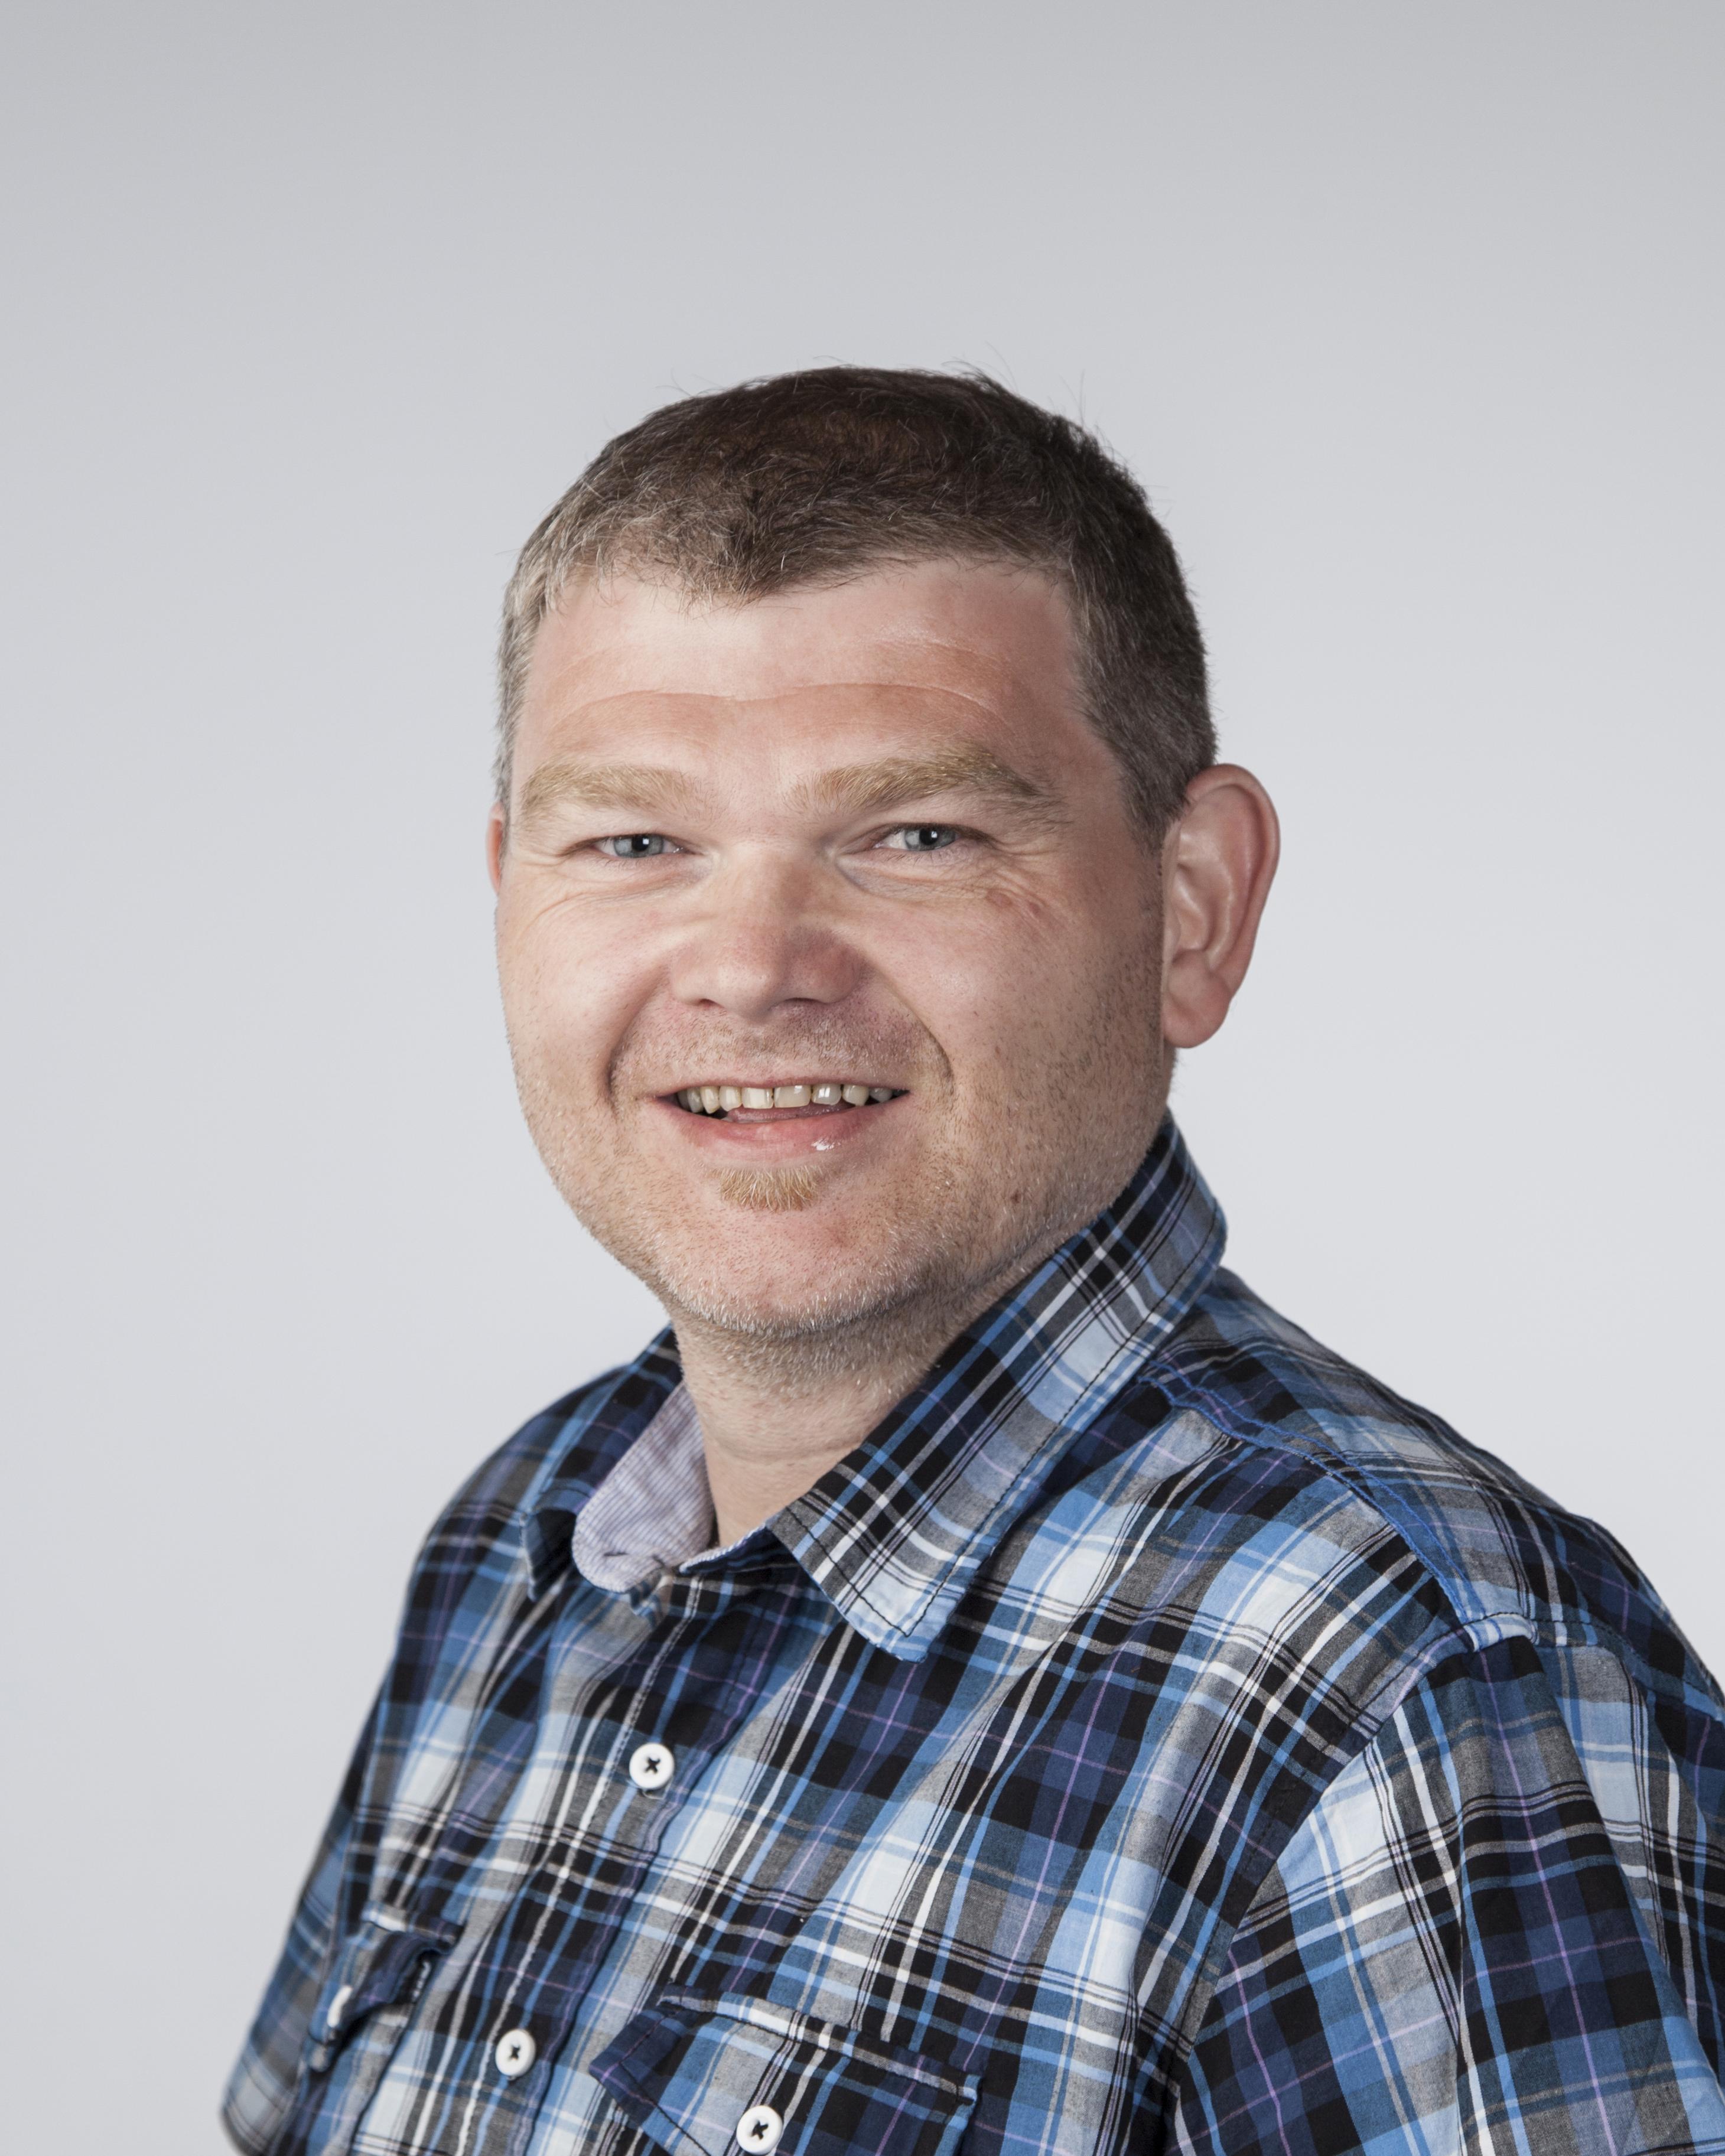 Lars VoГџler